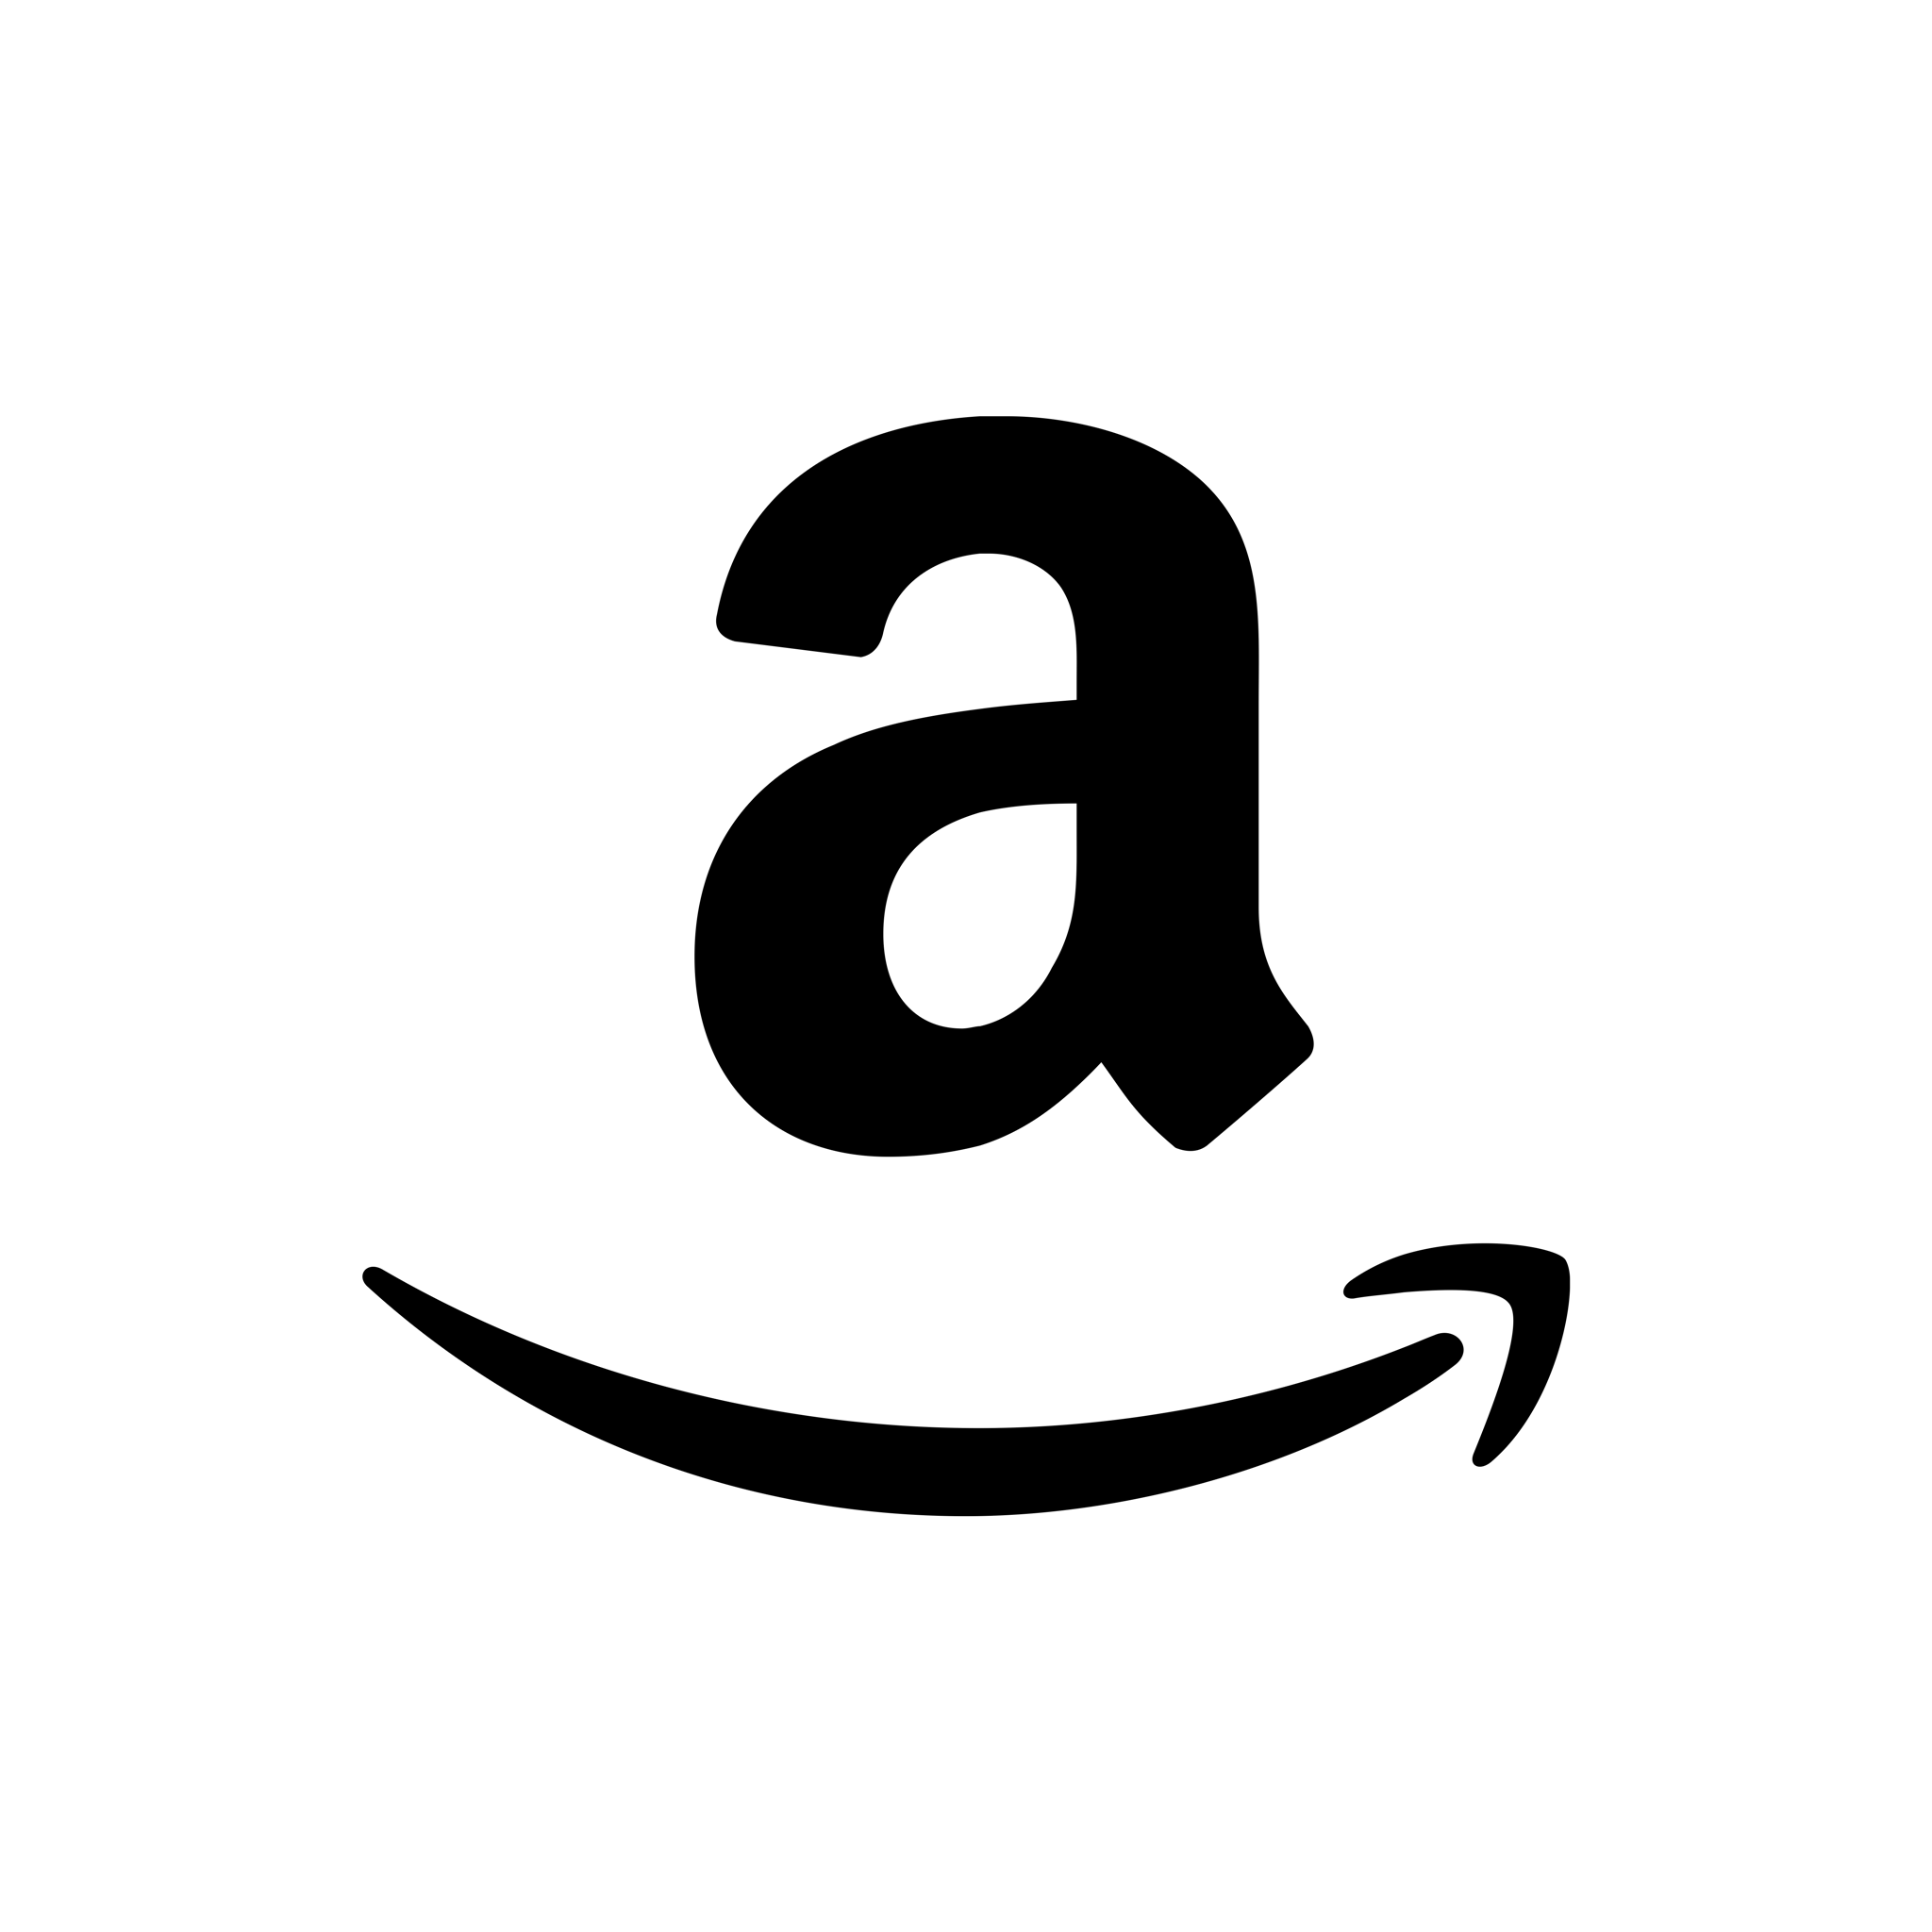 black, amazon icon